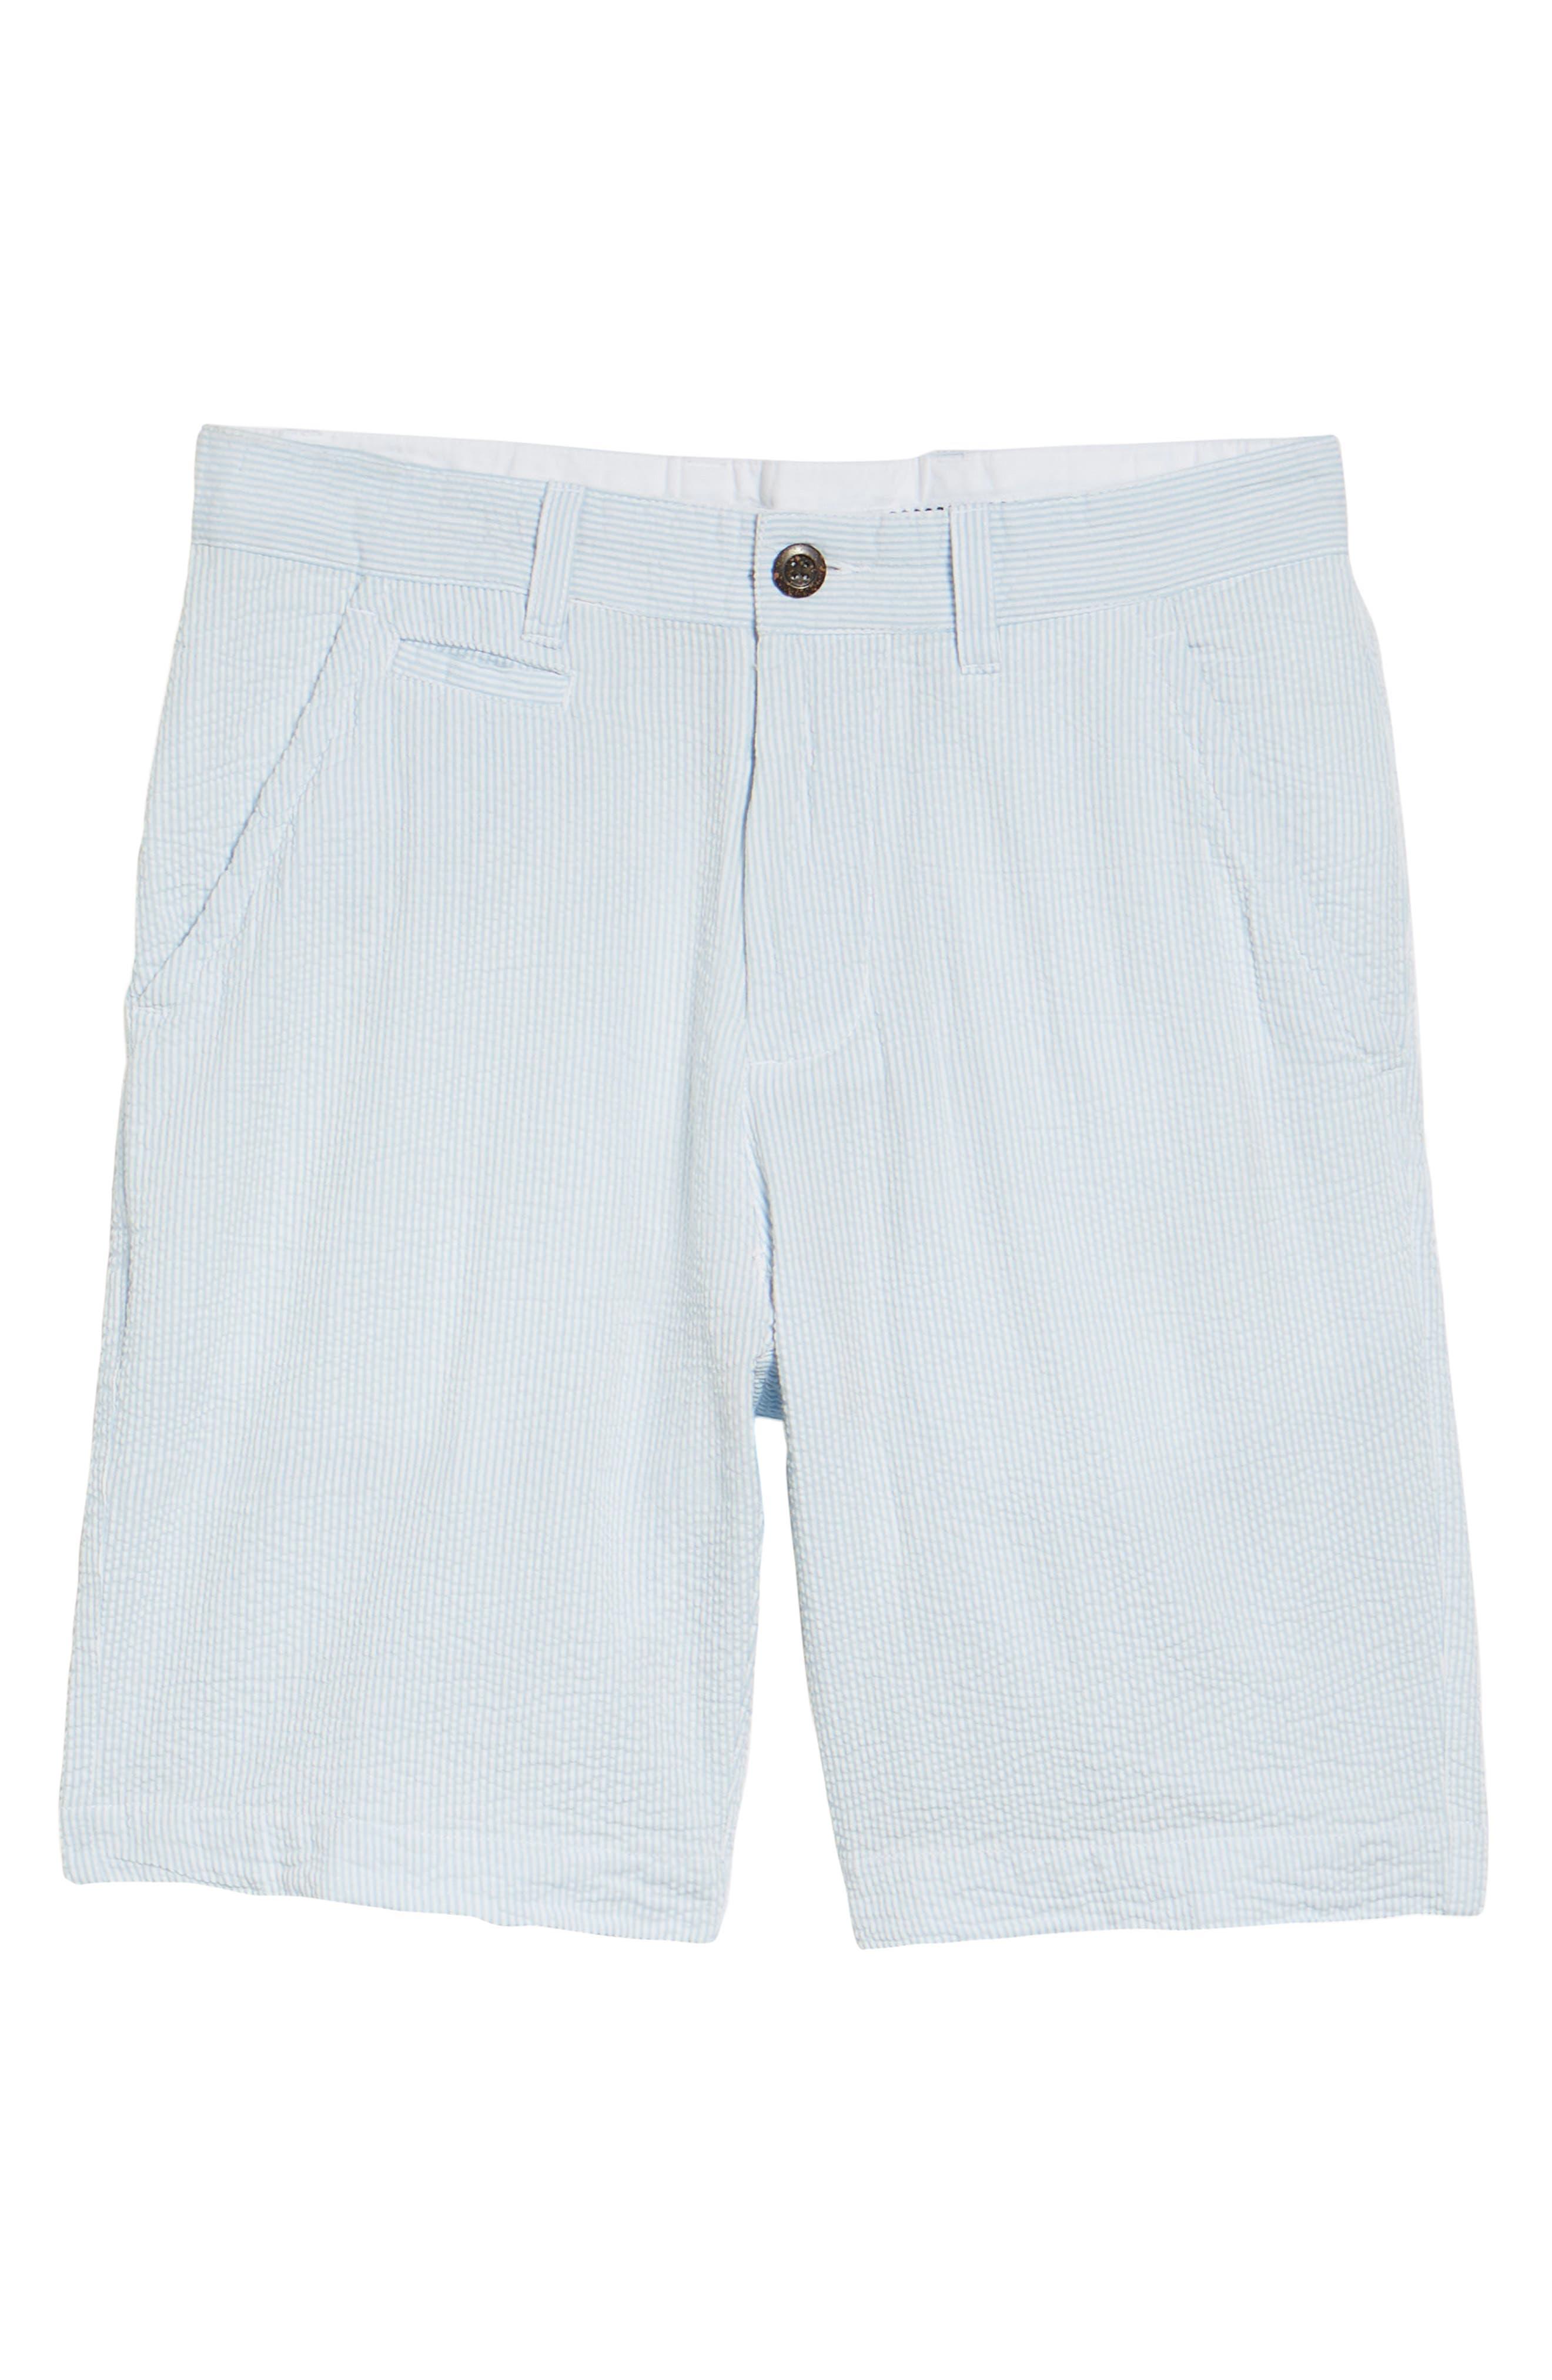 Vintage Wash Seersucker Shorts,                             Alternate thumbnail 6, color,                             450